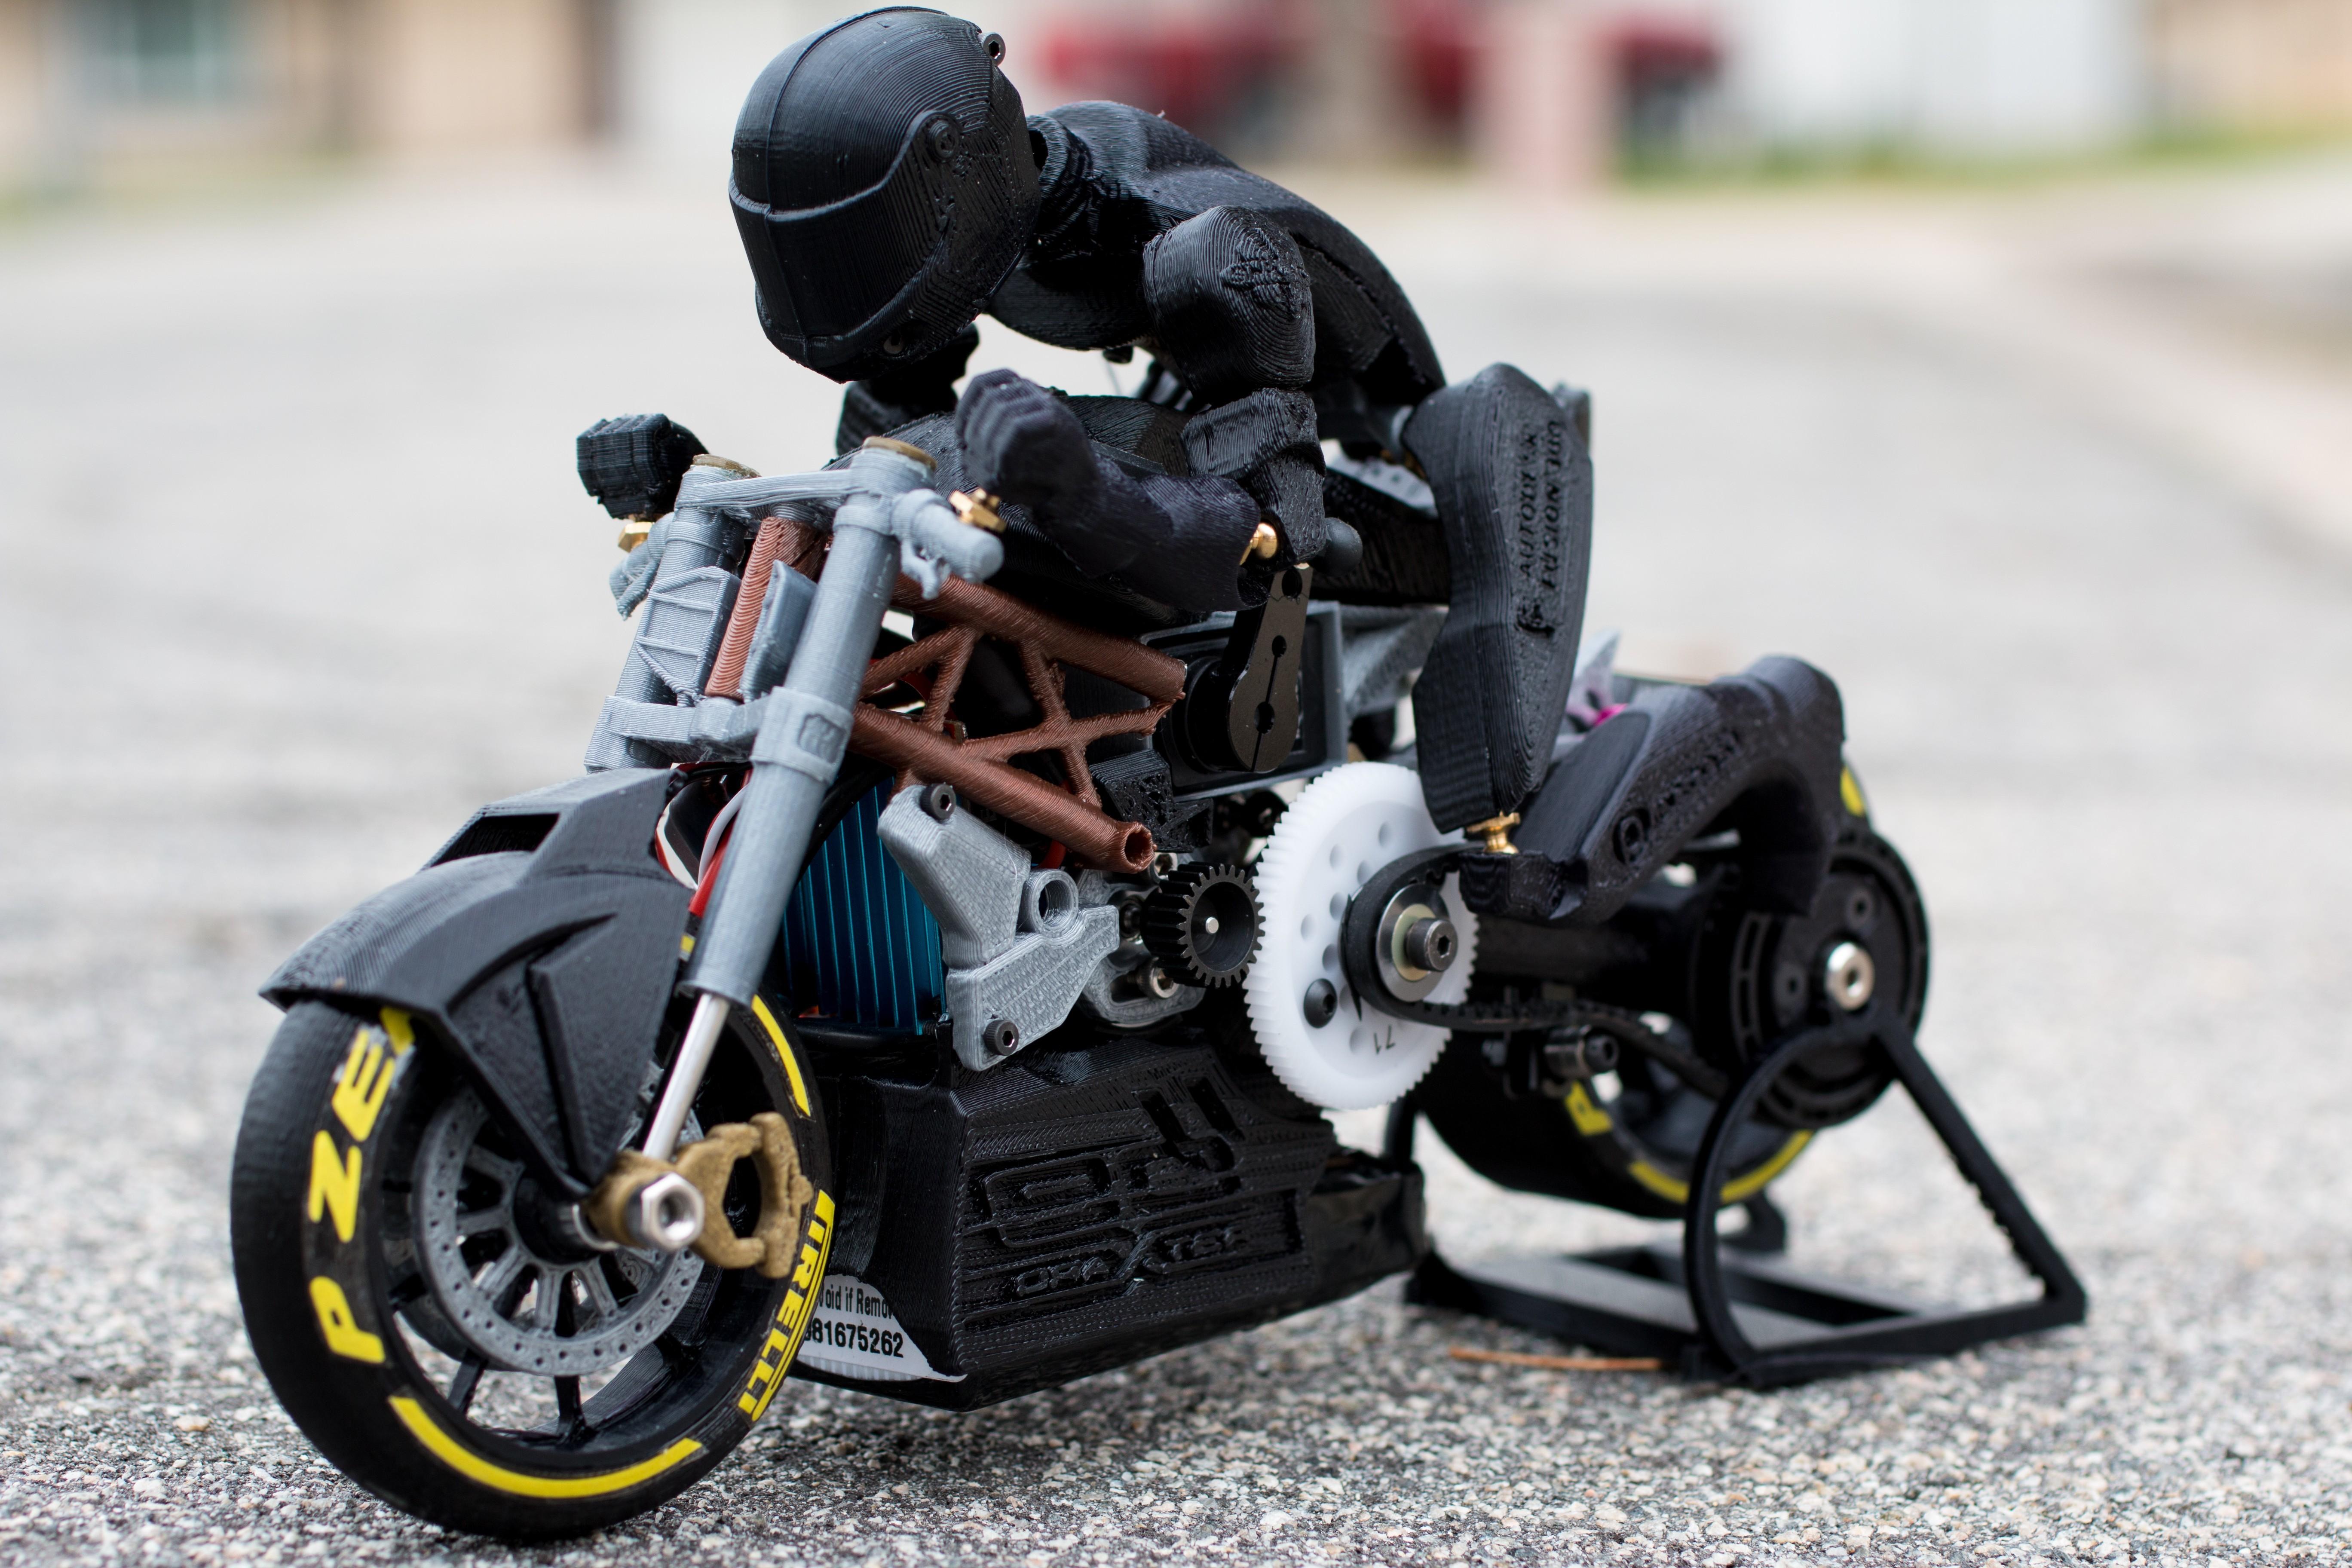 _MG_4475.jpg Download free STL file 2016 Ducati Draxter Concept Drag Bike RC • 3D printer template, brett